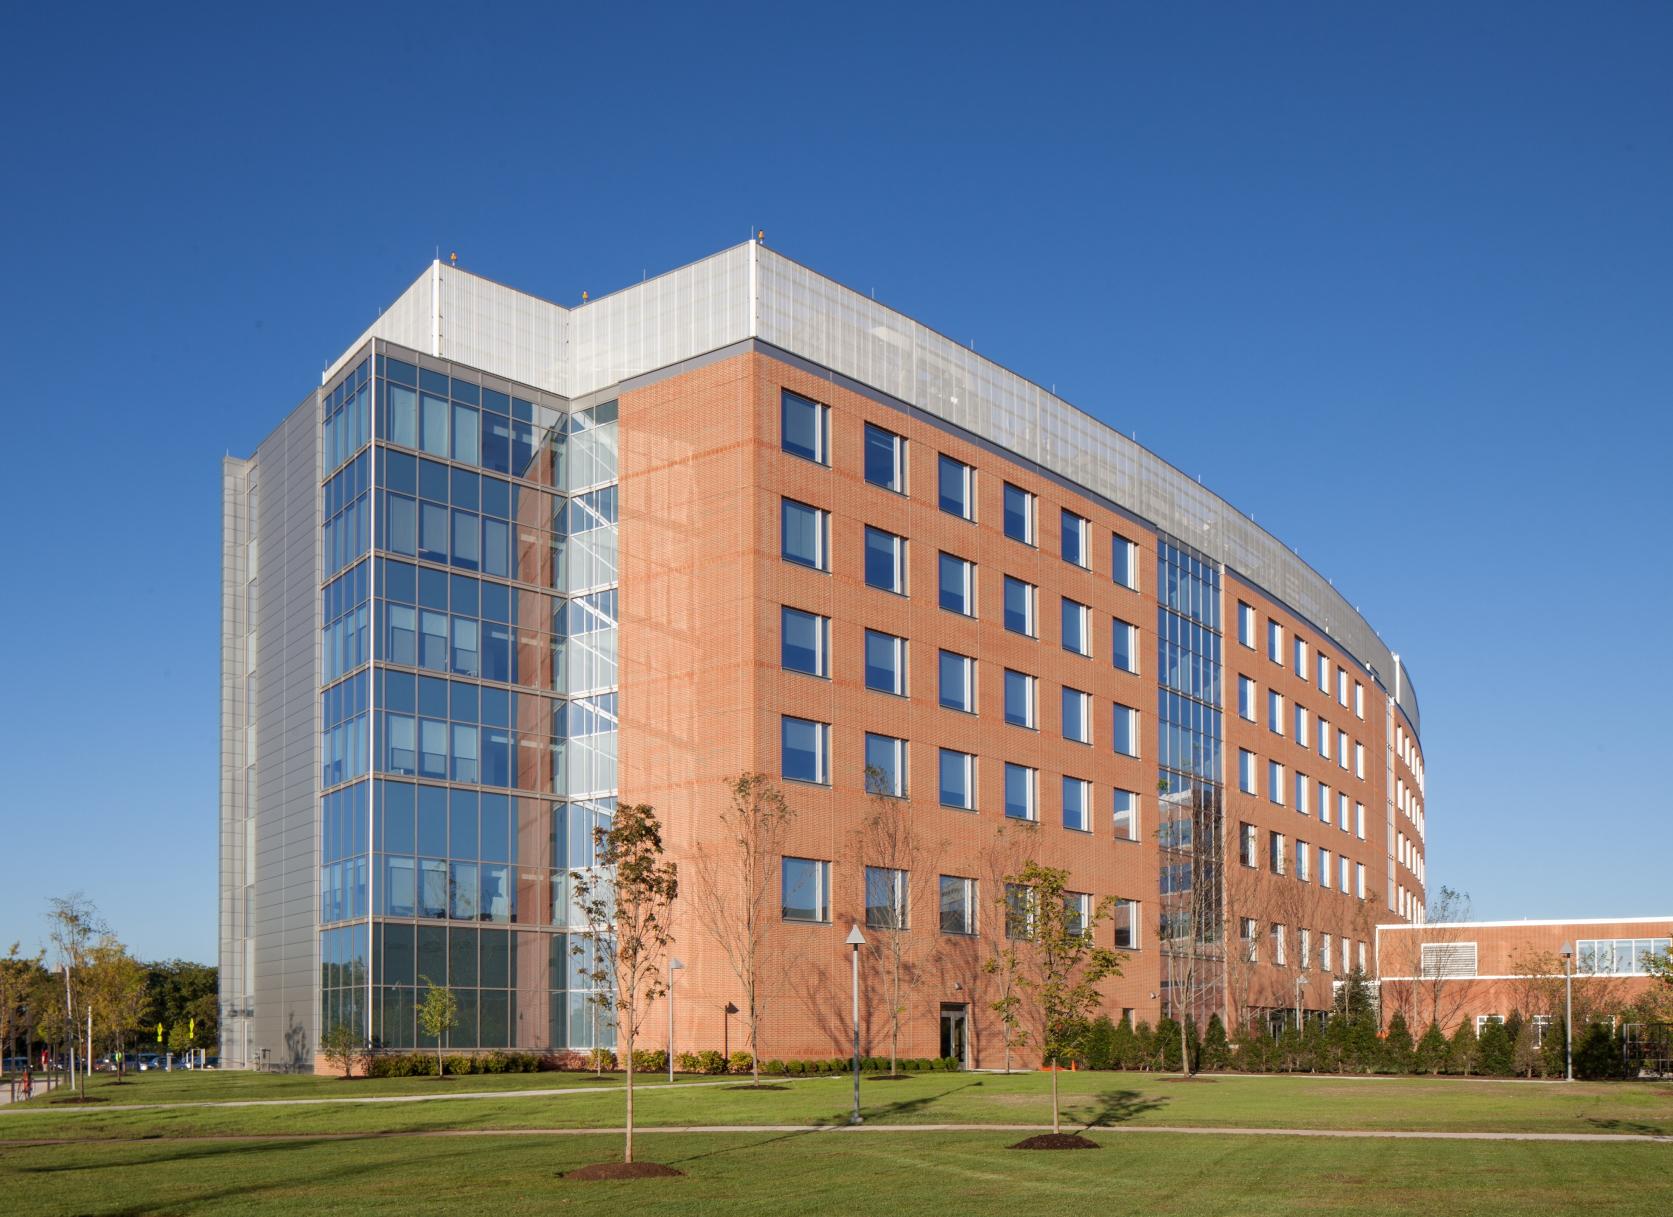 University Princeton Plainsboro Hospital